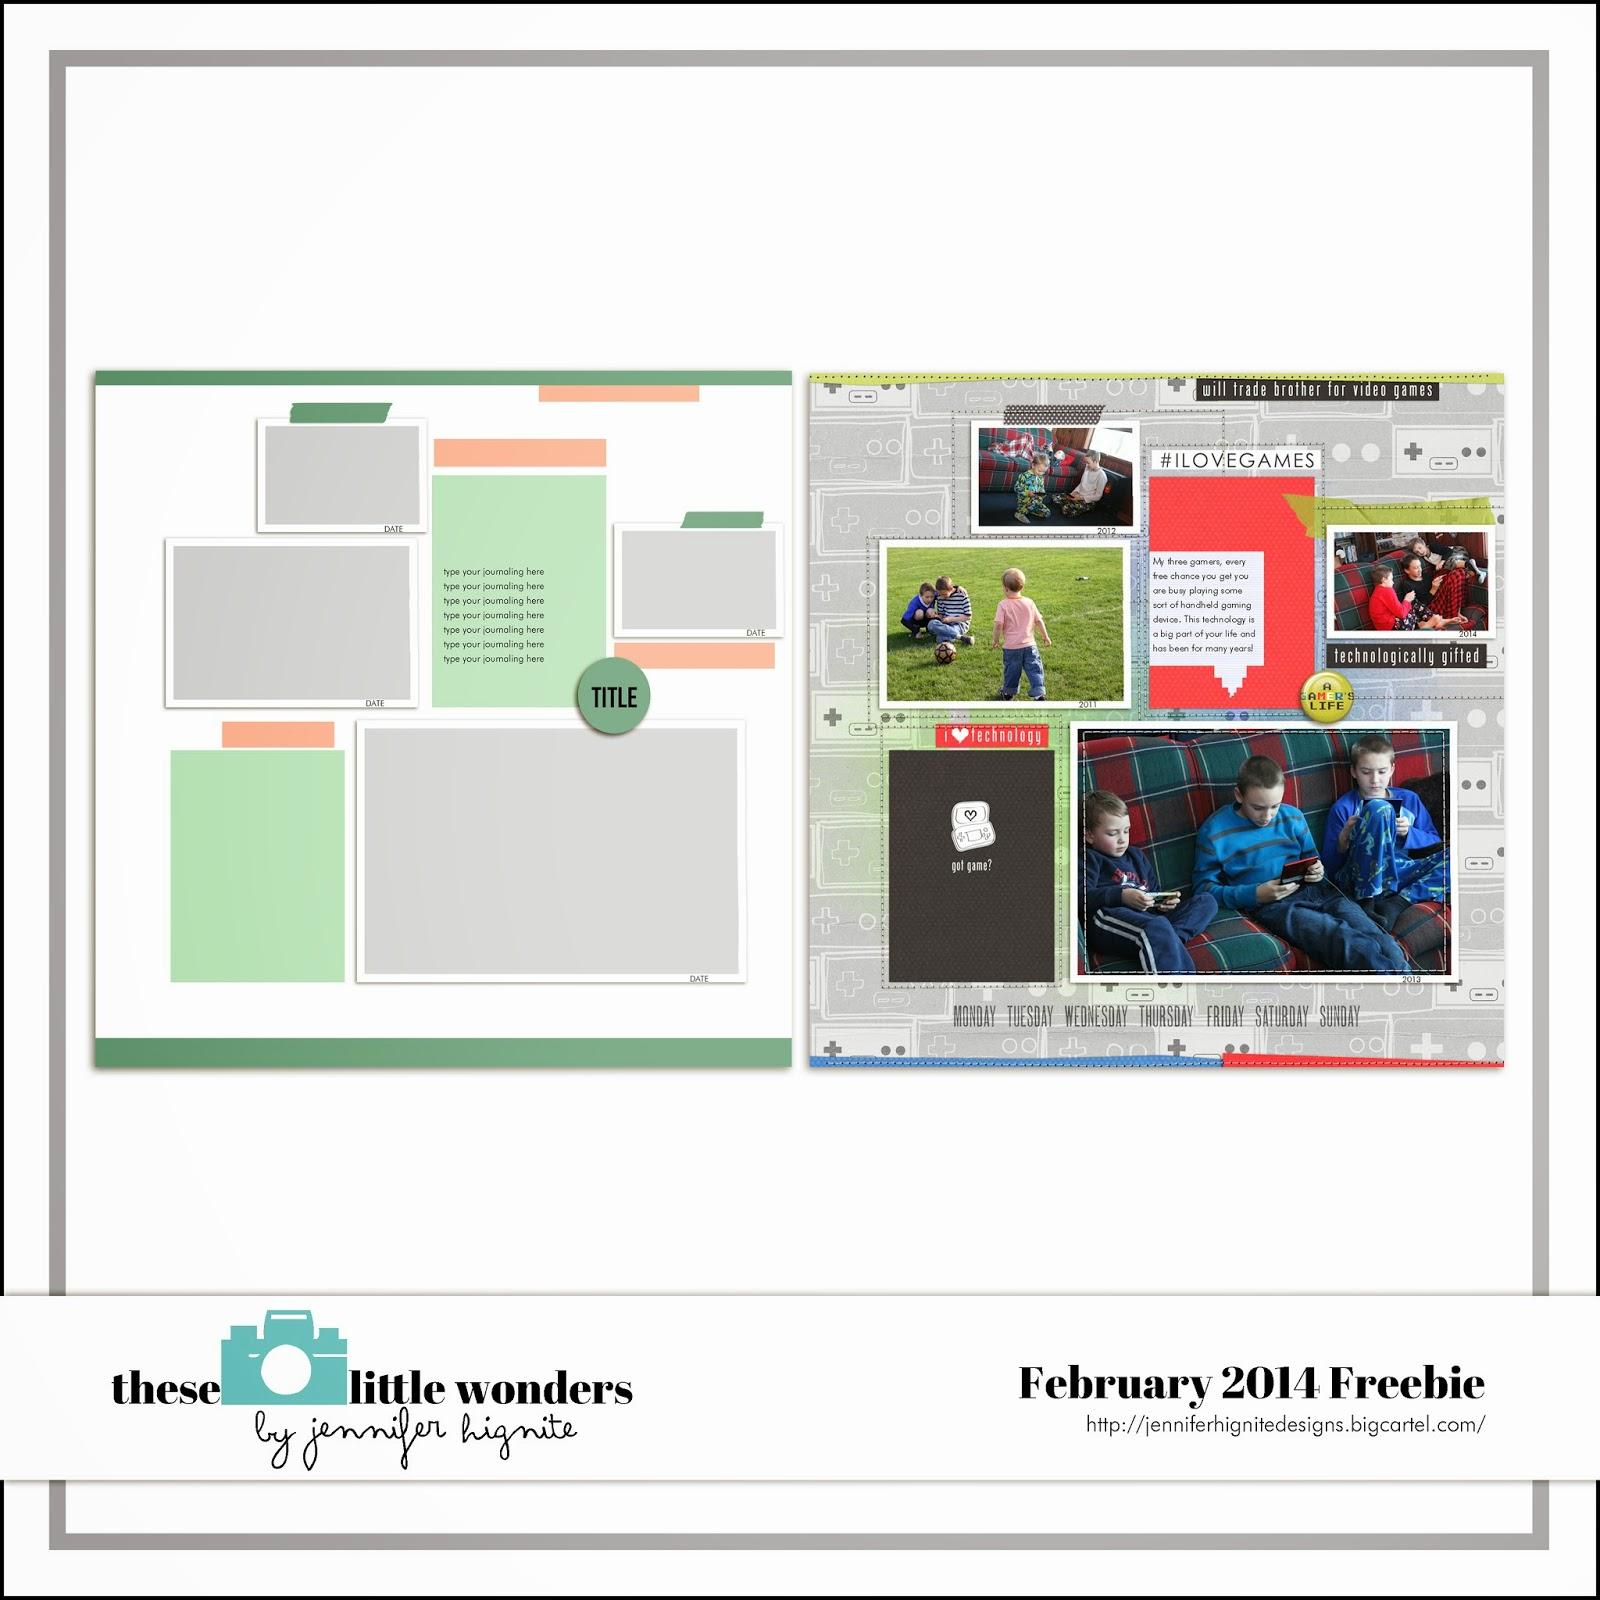 http://1.bp.blogspot.com/-3dmaRiRadMg/UvJaBGAjUiI/AAAAAAABbh0/21aEvvpojTs/s1600/TLW_+February+freebie+preview.jpg